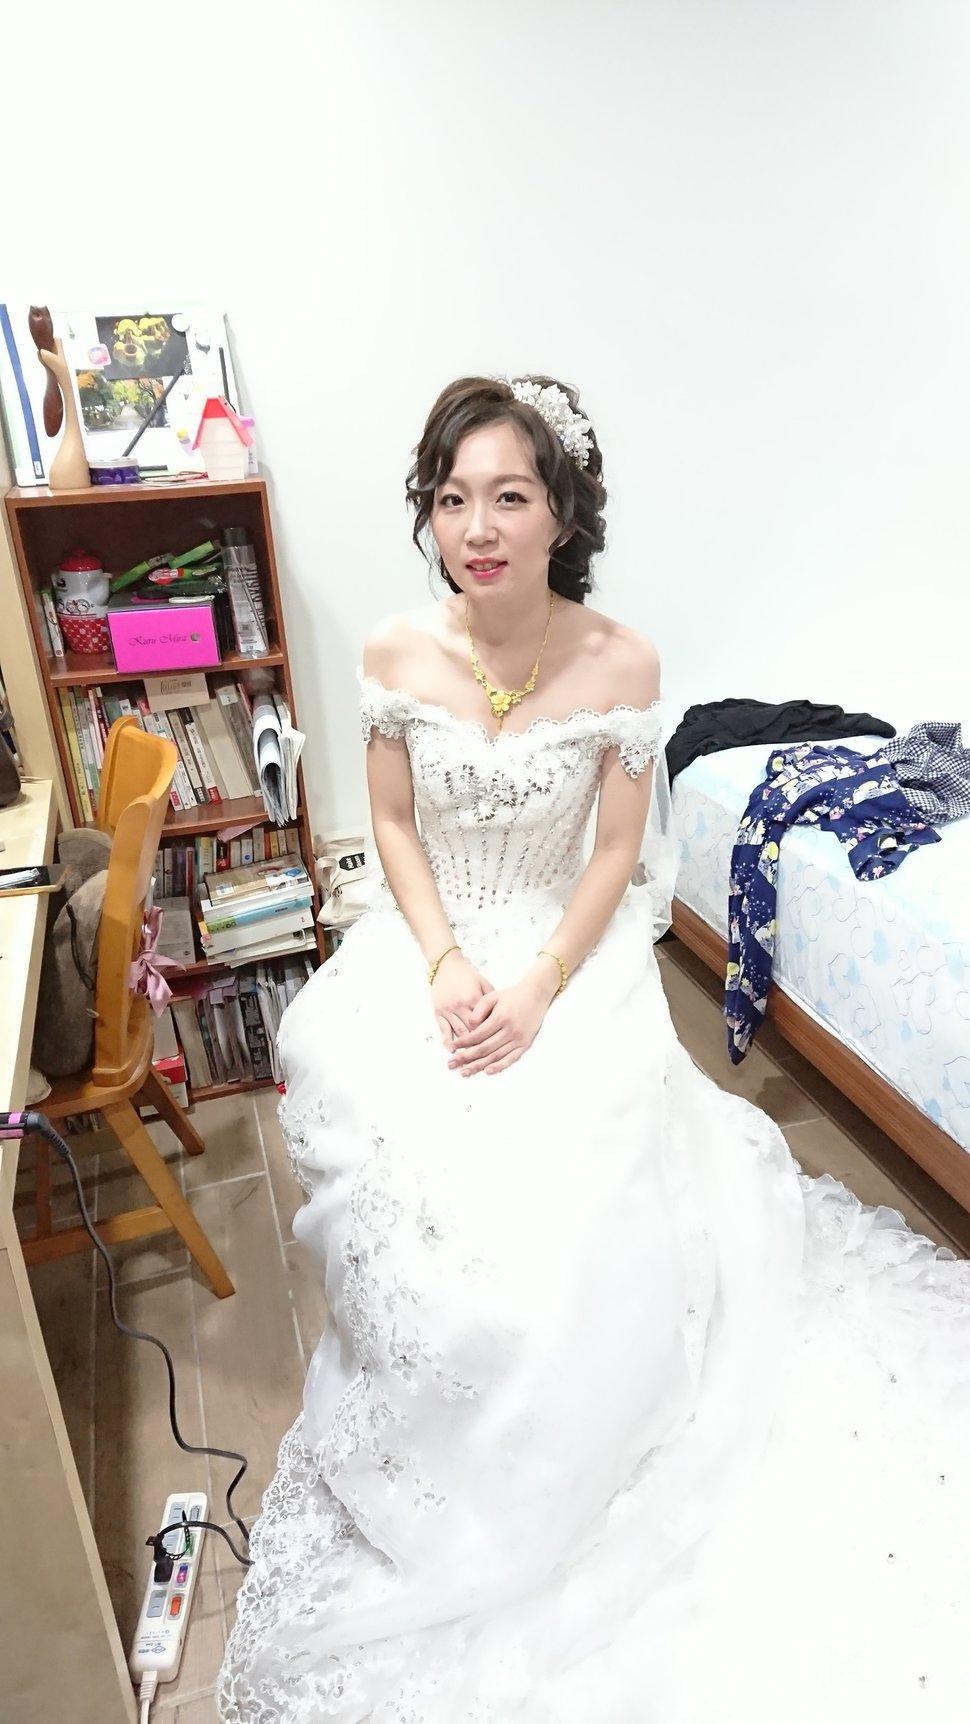 DSC_0374 - 花精靈婚紗∣攝影∣新秘 - 結婚吧